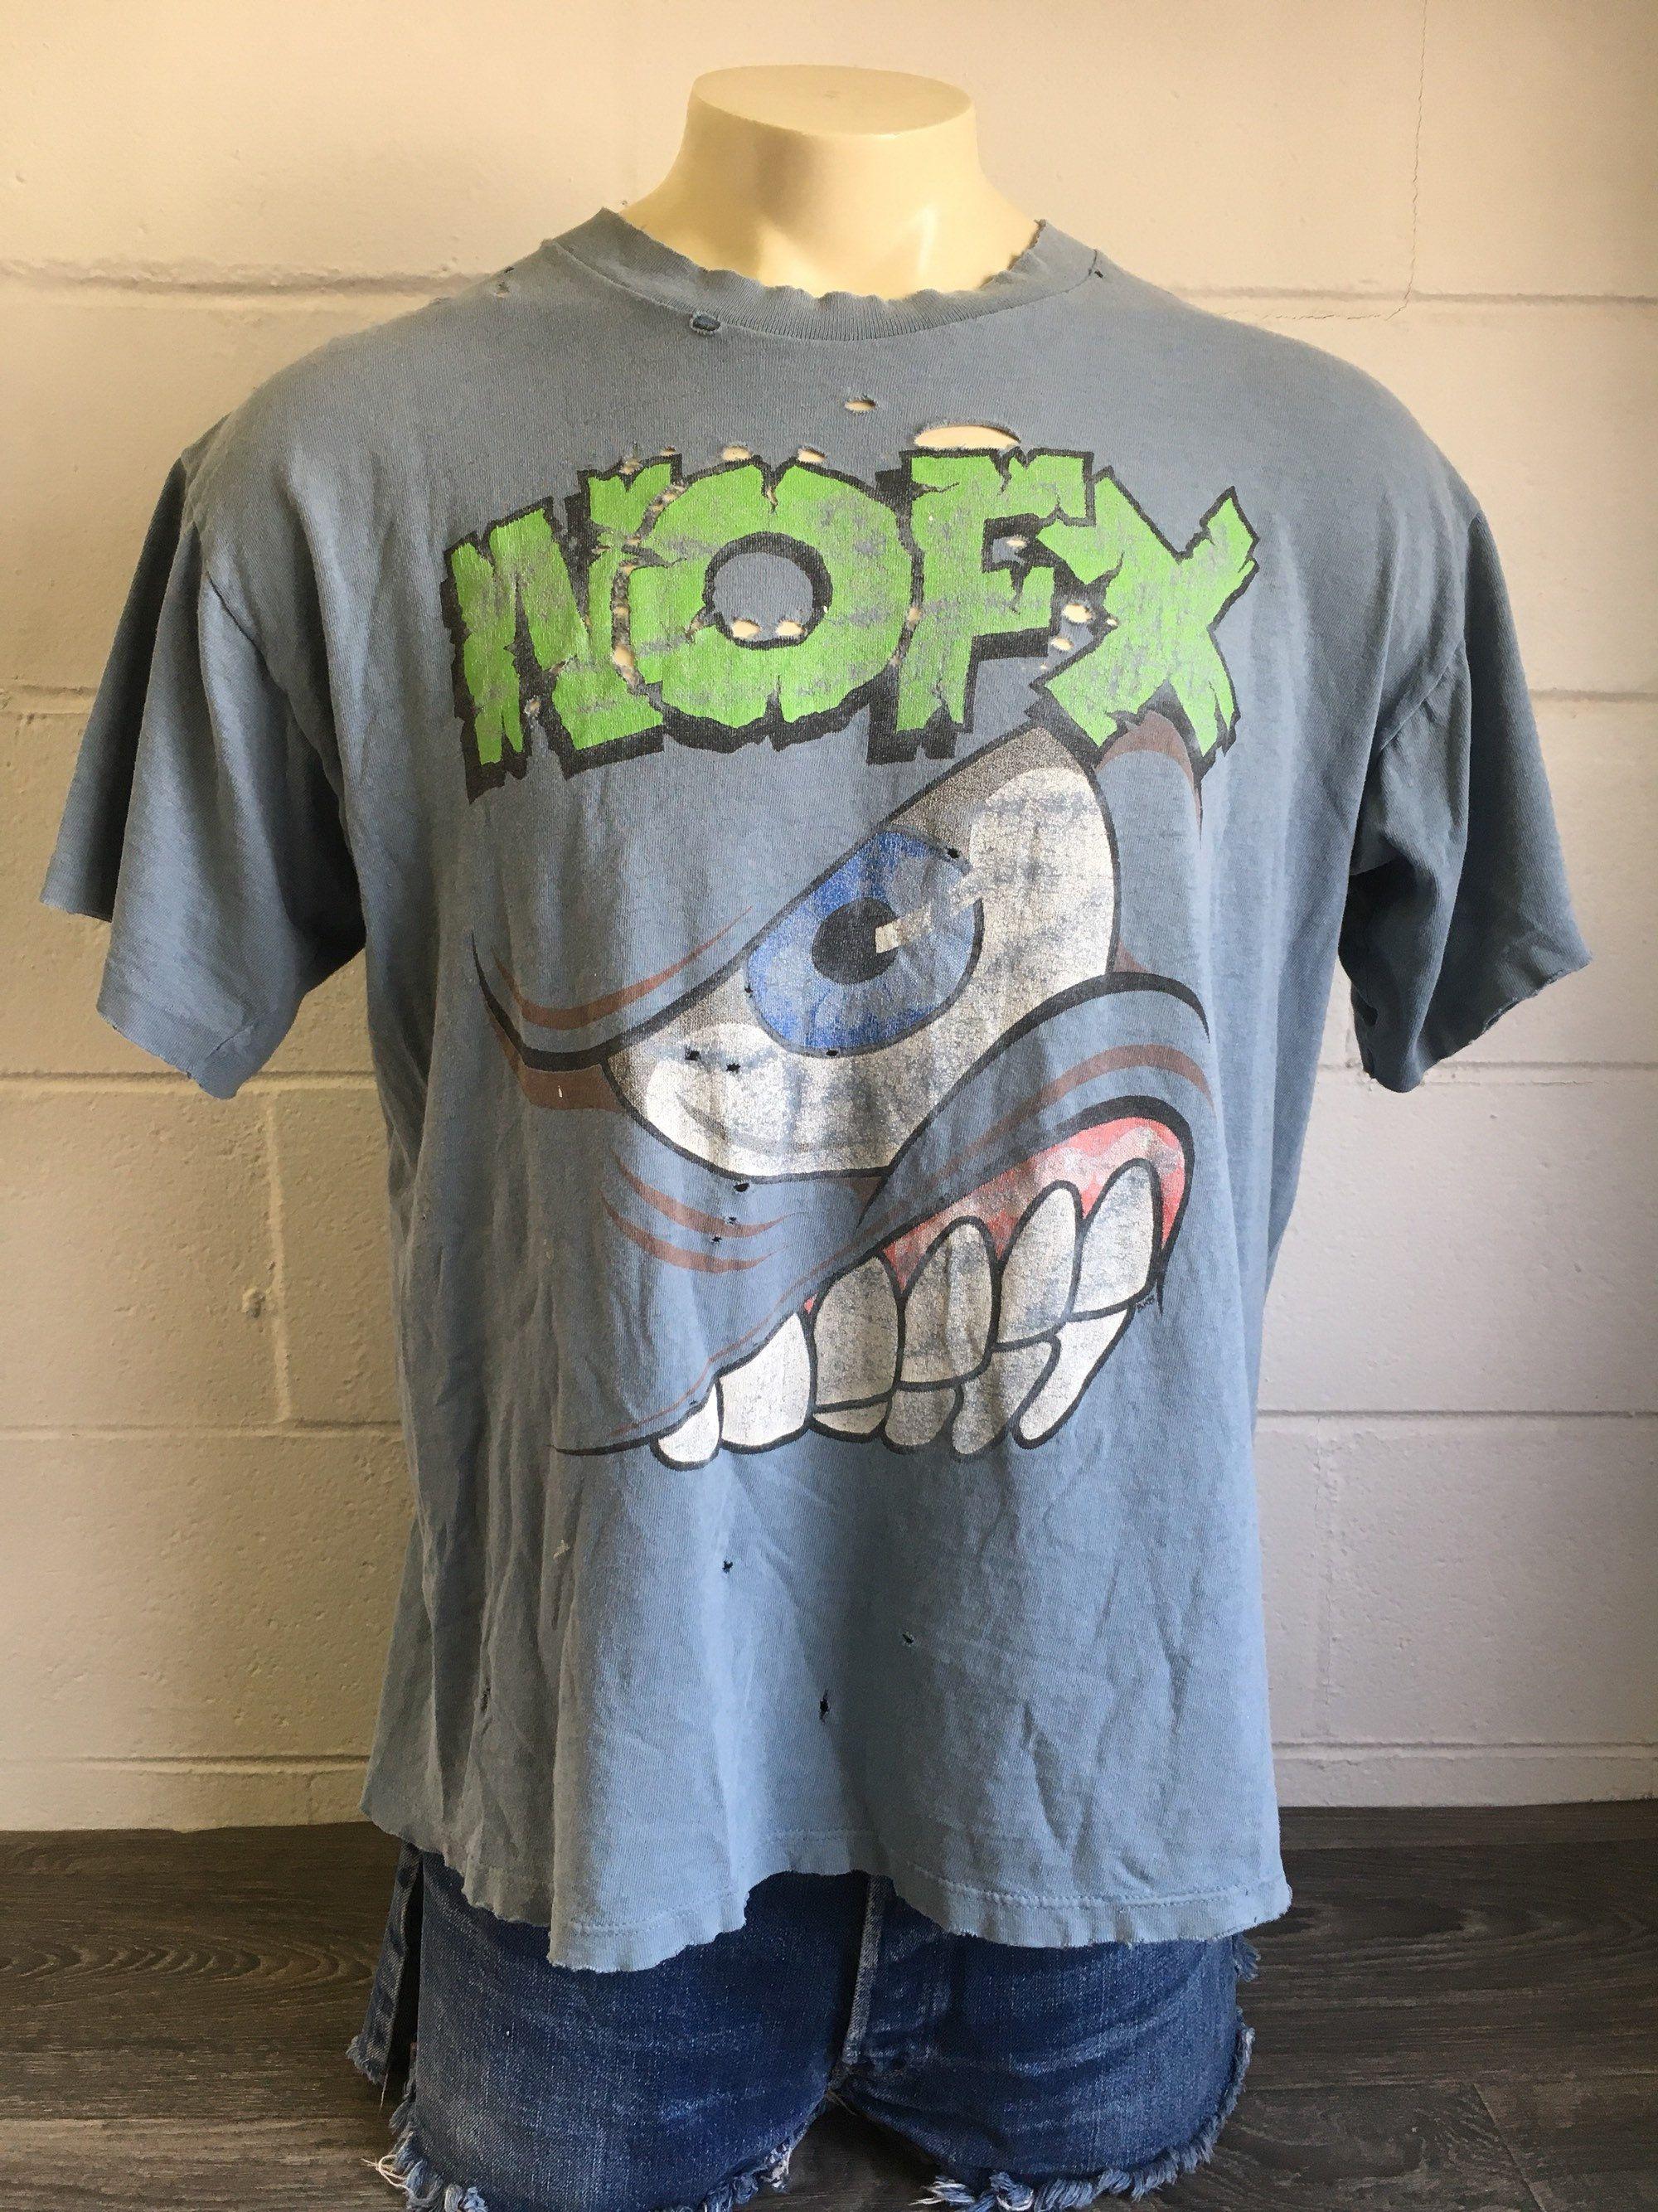 c464a68c NOFX Shirt 1994 90s Vintage Mons-Tour PUNK Rock Band Tshirt Thrashed  Distressed Hardcore Skate Rare Tee XL by sweetVTGtshirt on Etsy